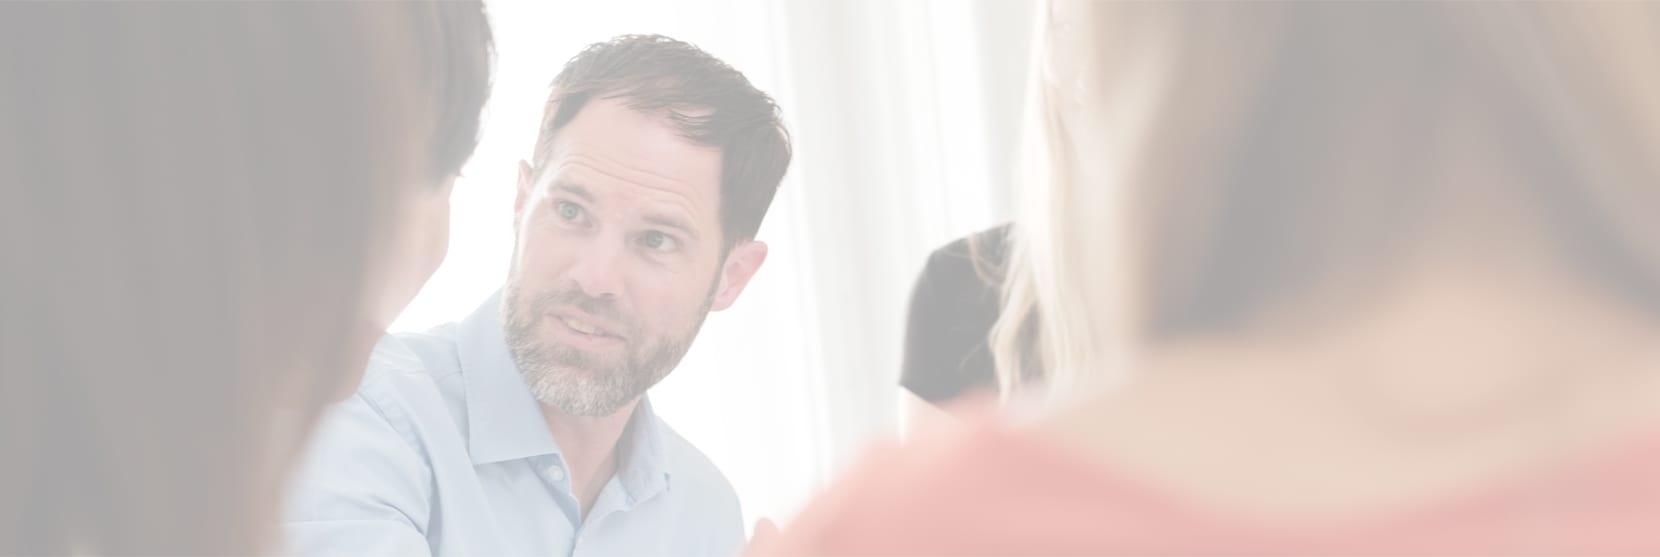 Kontakt zu Andreas Powisch, Markenberatung & Entwicklung, Seminare, Coaching